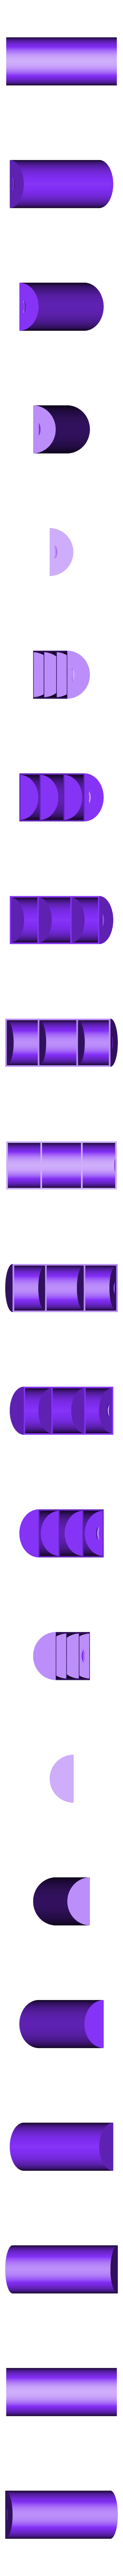 Internal drawner 2.stl Download free STL file cryptex • 3D printable model, MAKINA